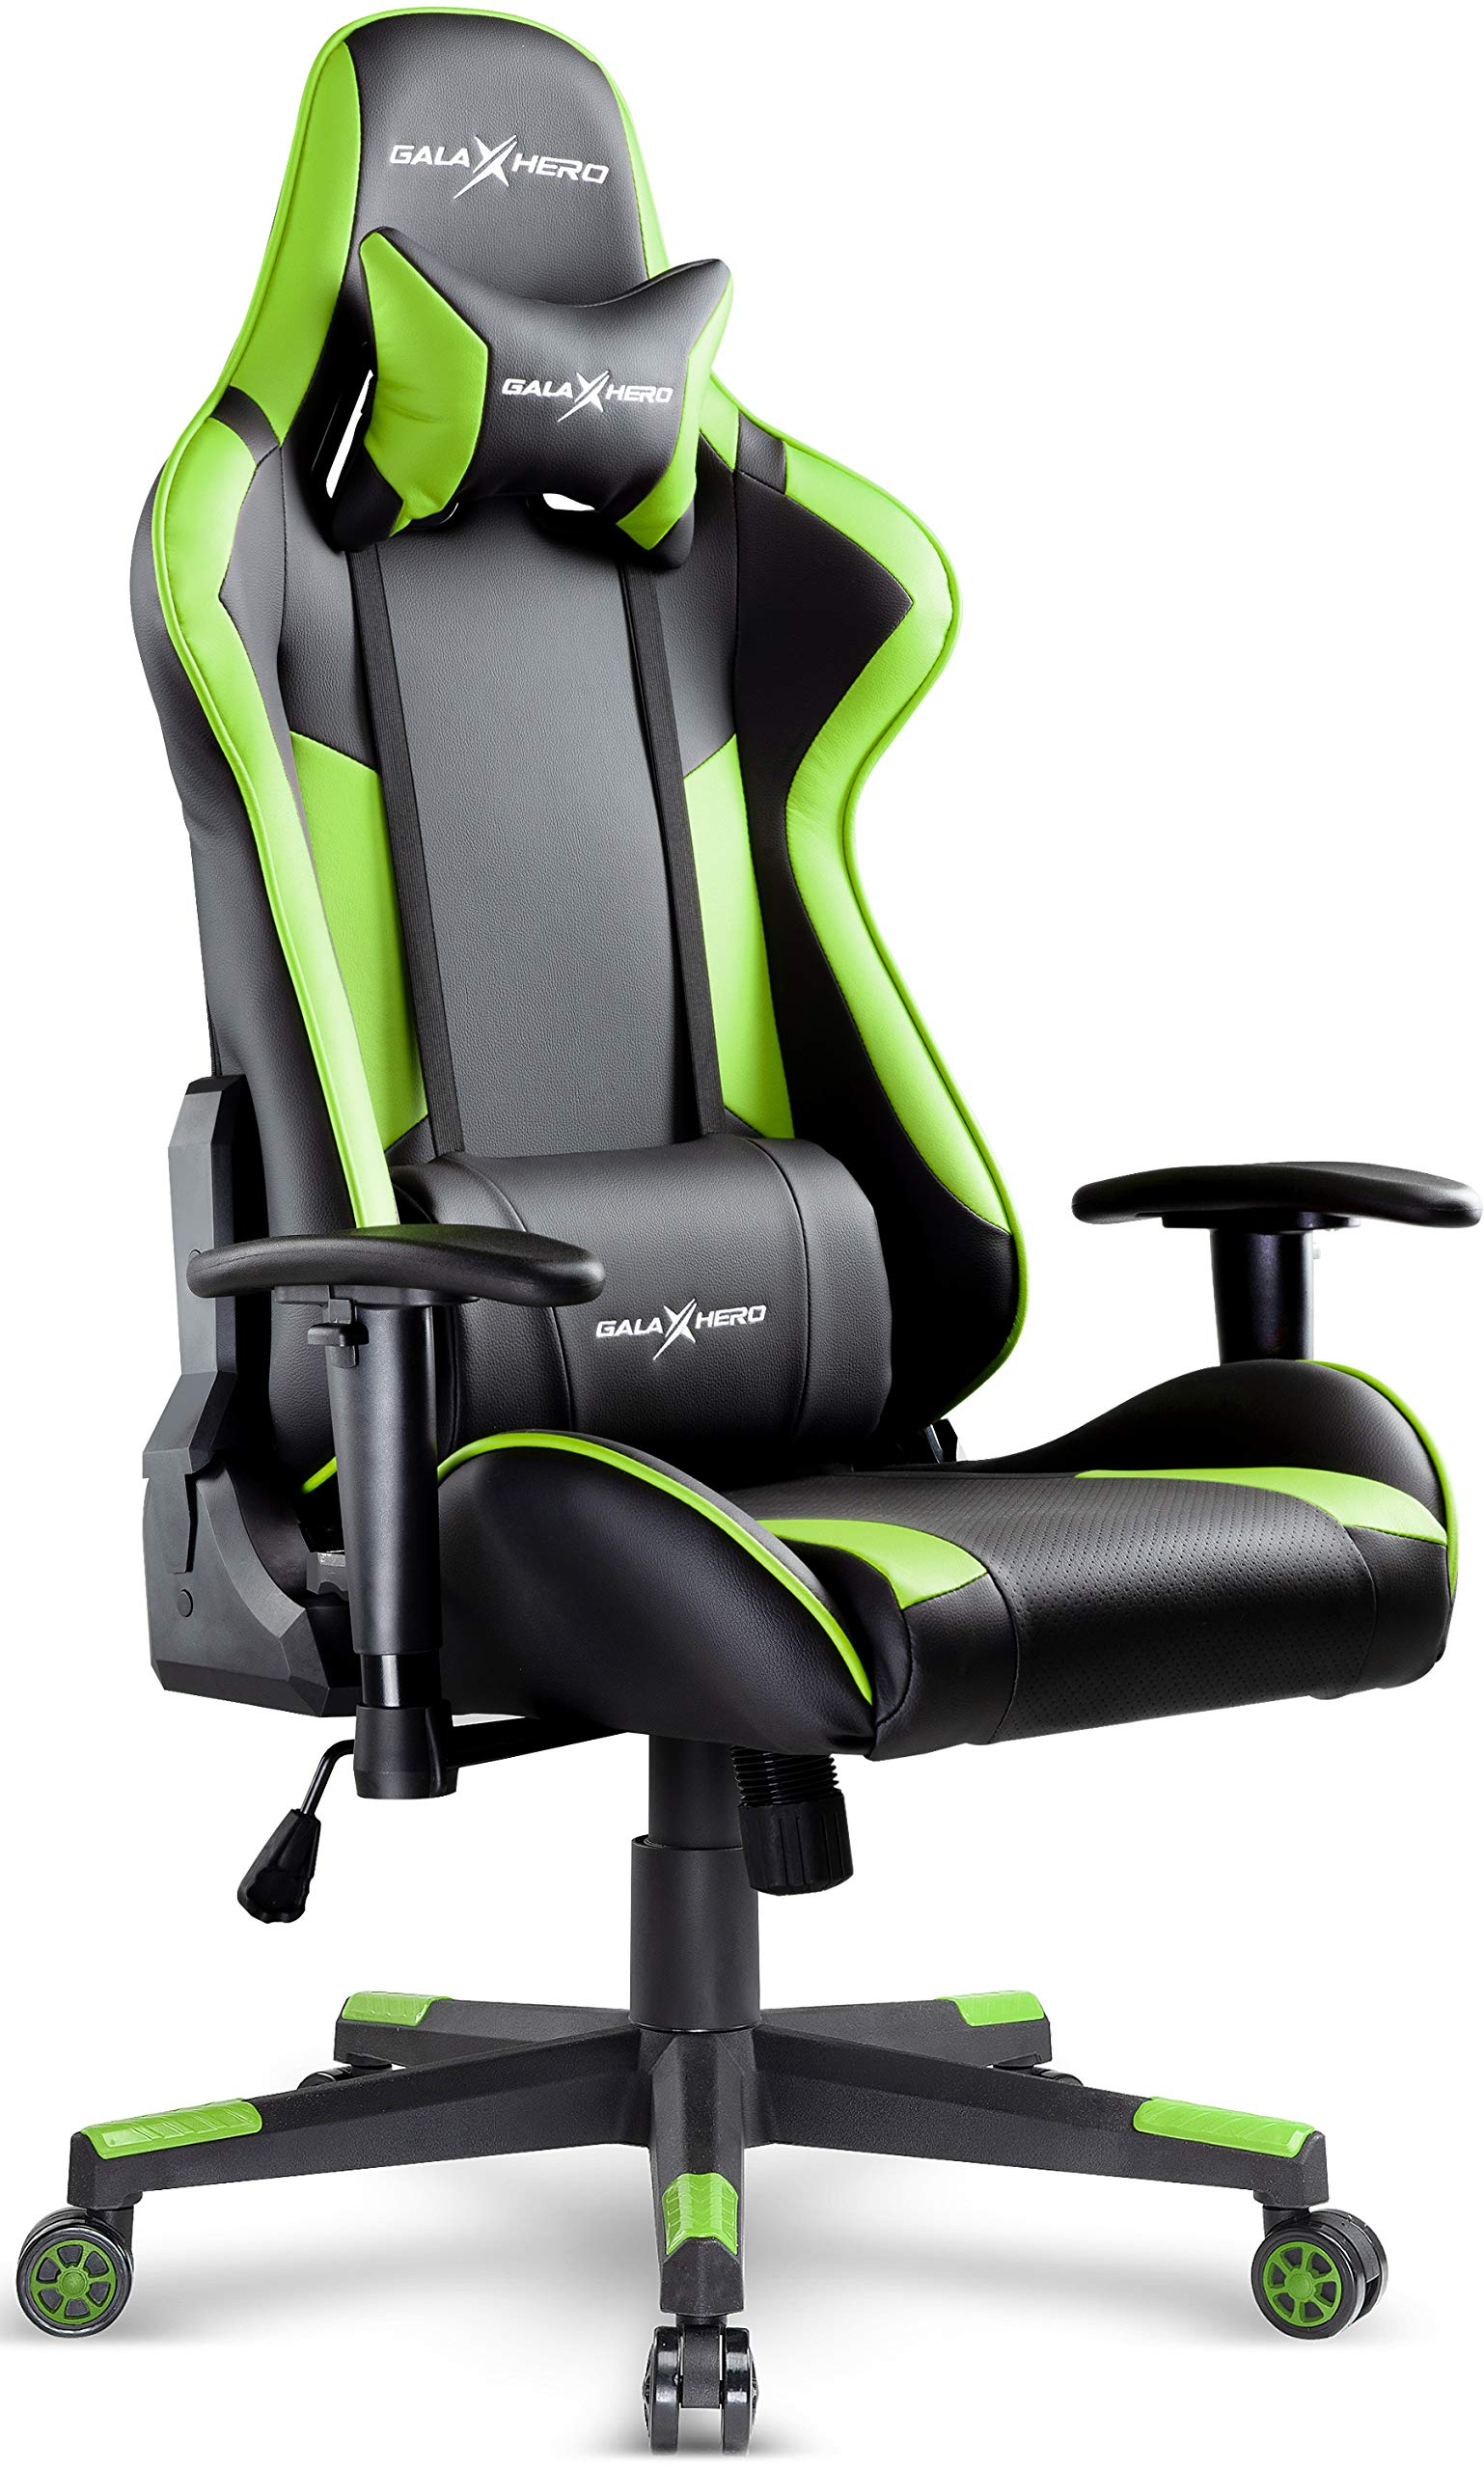 GALAXHERO ゲーミングチェア オフィスチェア 多機能 通気性がいい座面 ゲーム用チェア 事務椅子 パソコンチェア リクライニング ハイバック ヘッドレスト 腰にやさしいランバーサポート 2Dひじ掛け PUレザー MF39D